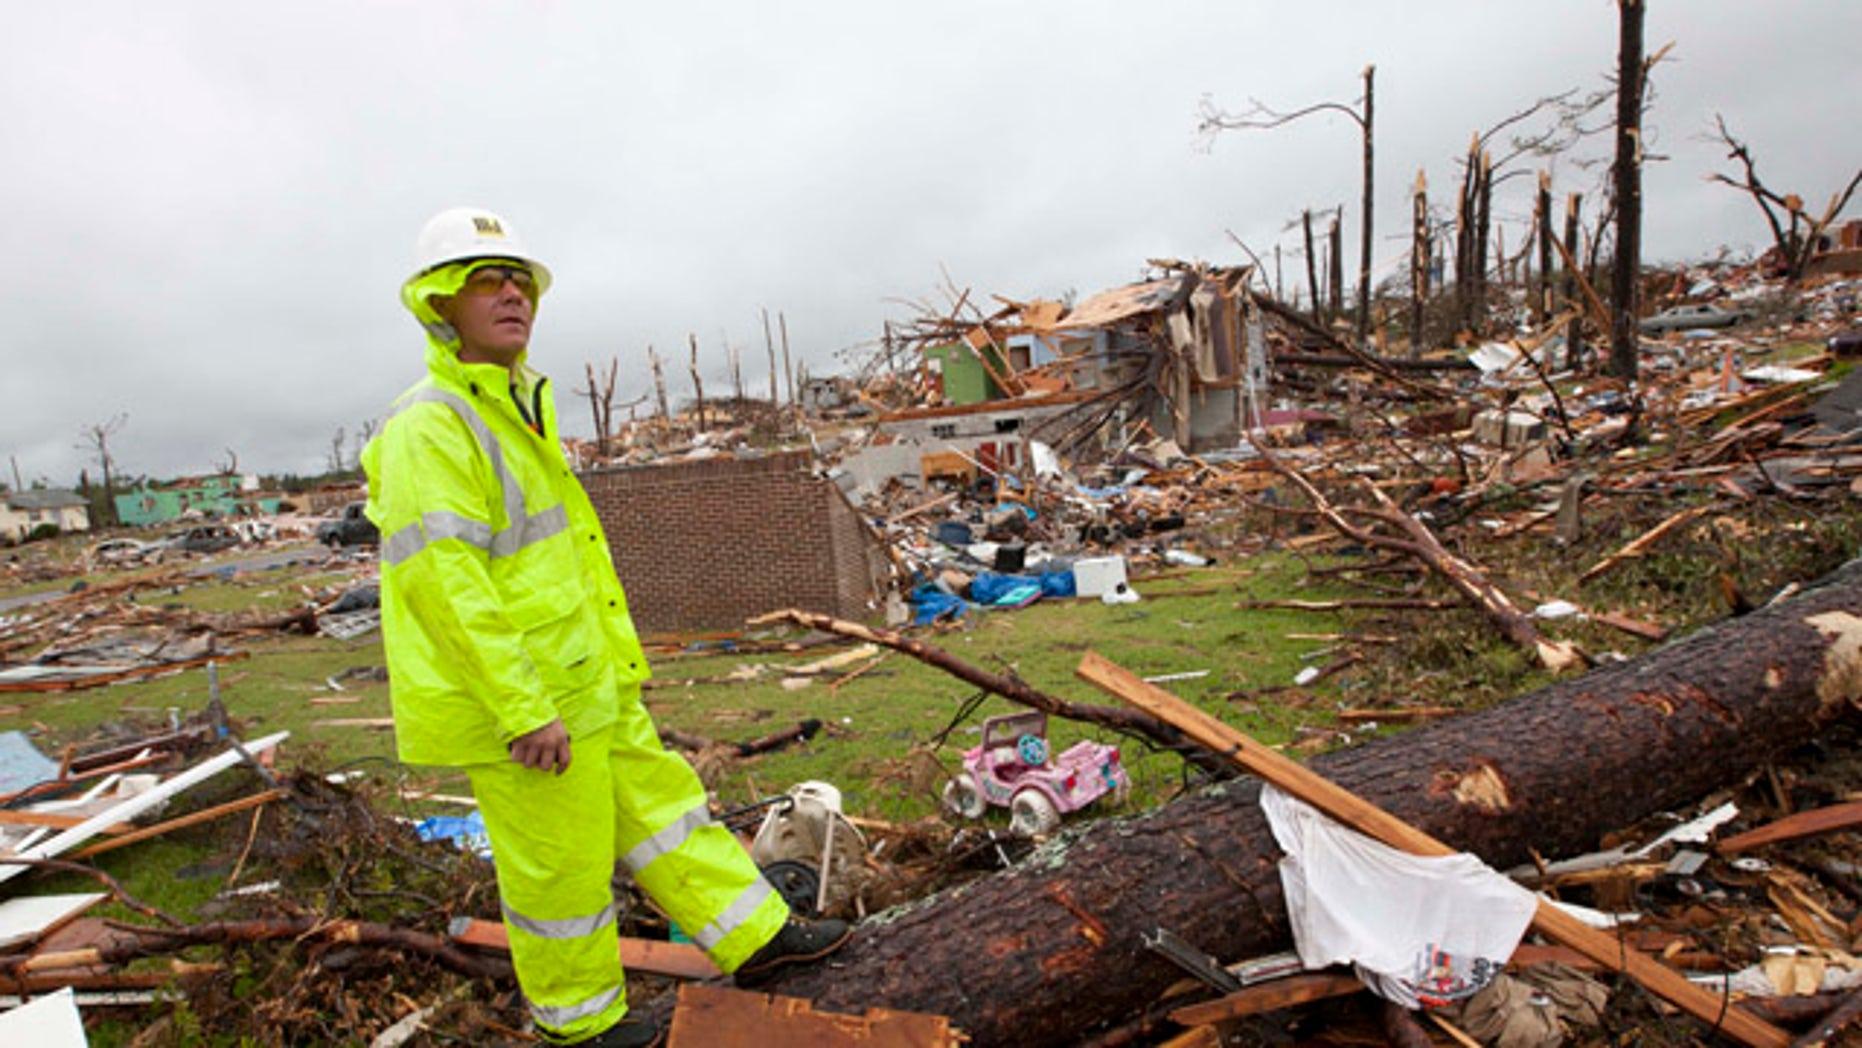 May 3: Lineman Derrick Heisz of Broadhead, Wis., surveys the damage in Pratt City, Ala.